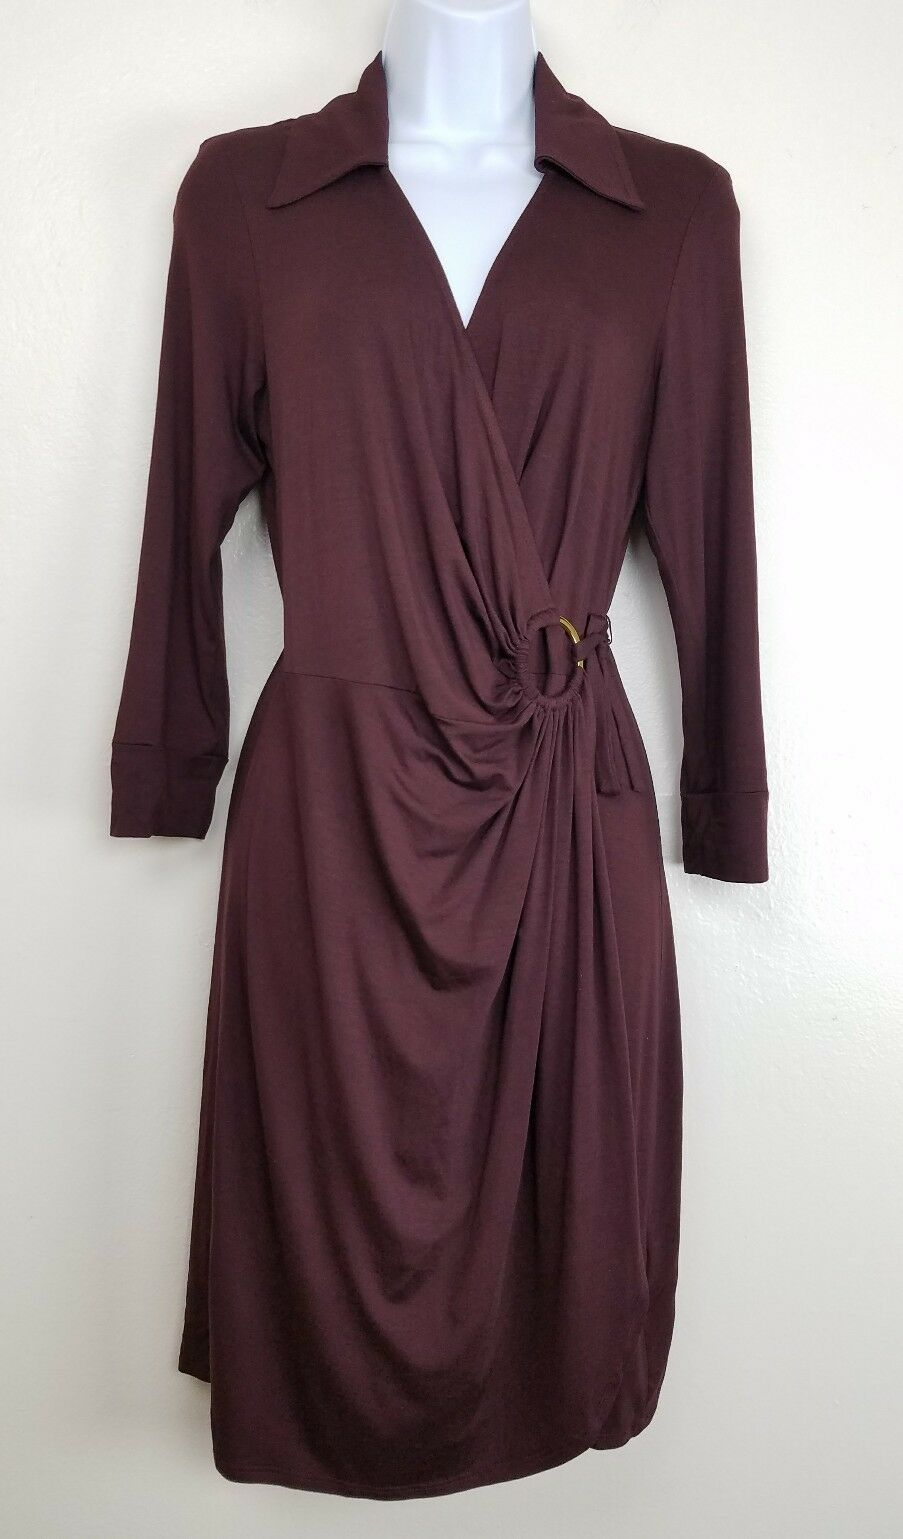 Trina Turk Burgundy Mahalo Wrap Dress 3 4 Sleeve Collar Viscose damen Größe 6